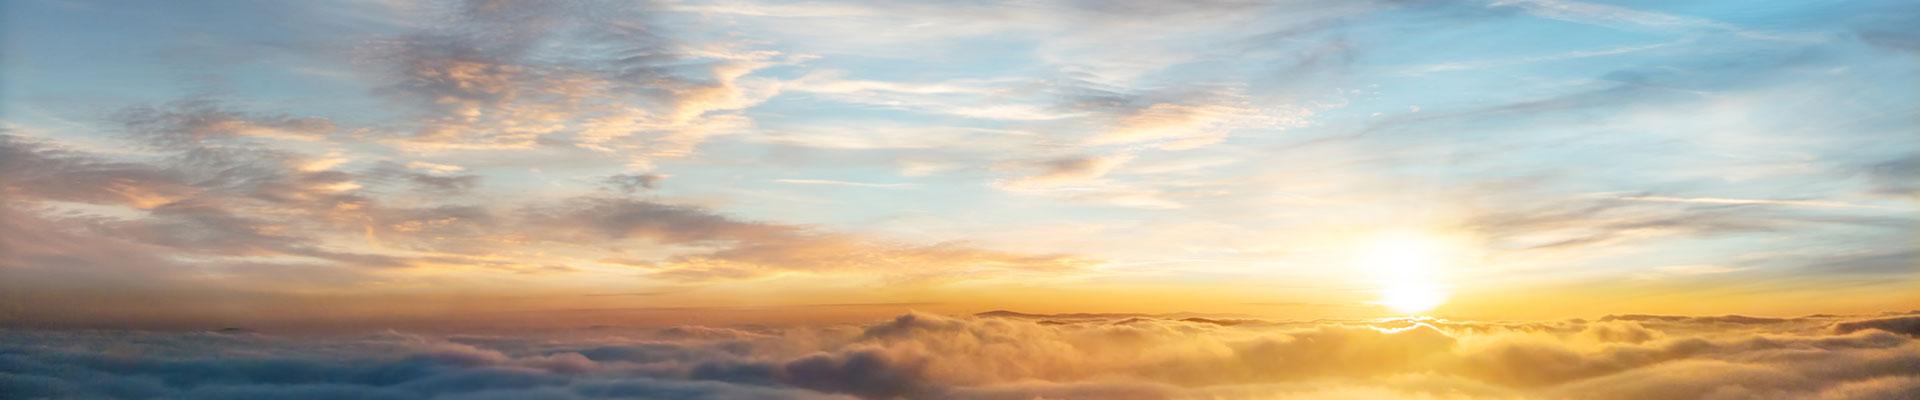 Six steps to Microsoft Azure and beyond